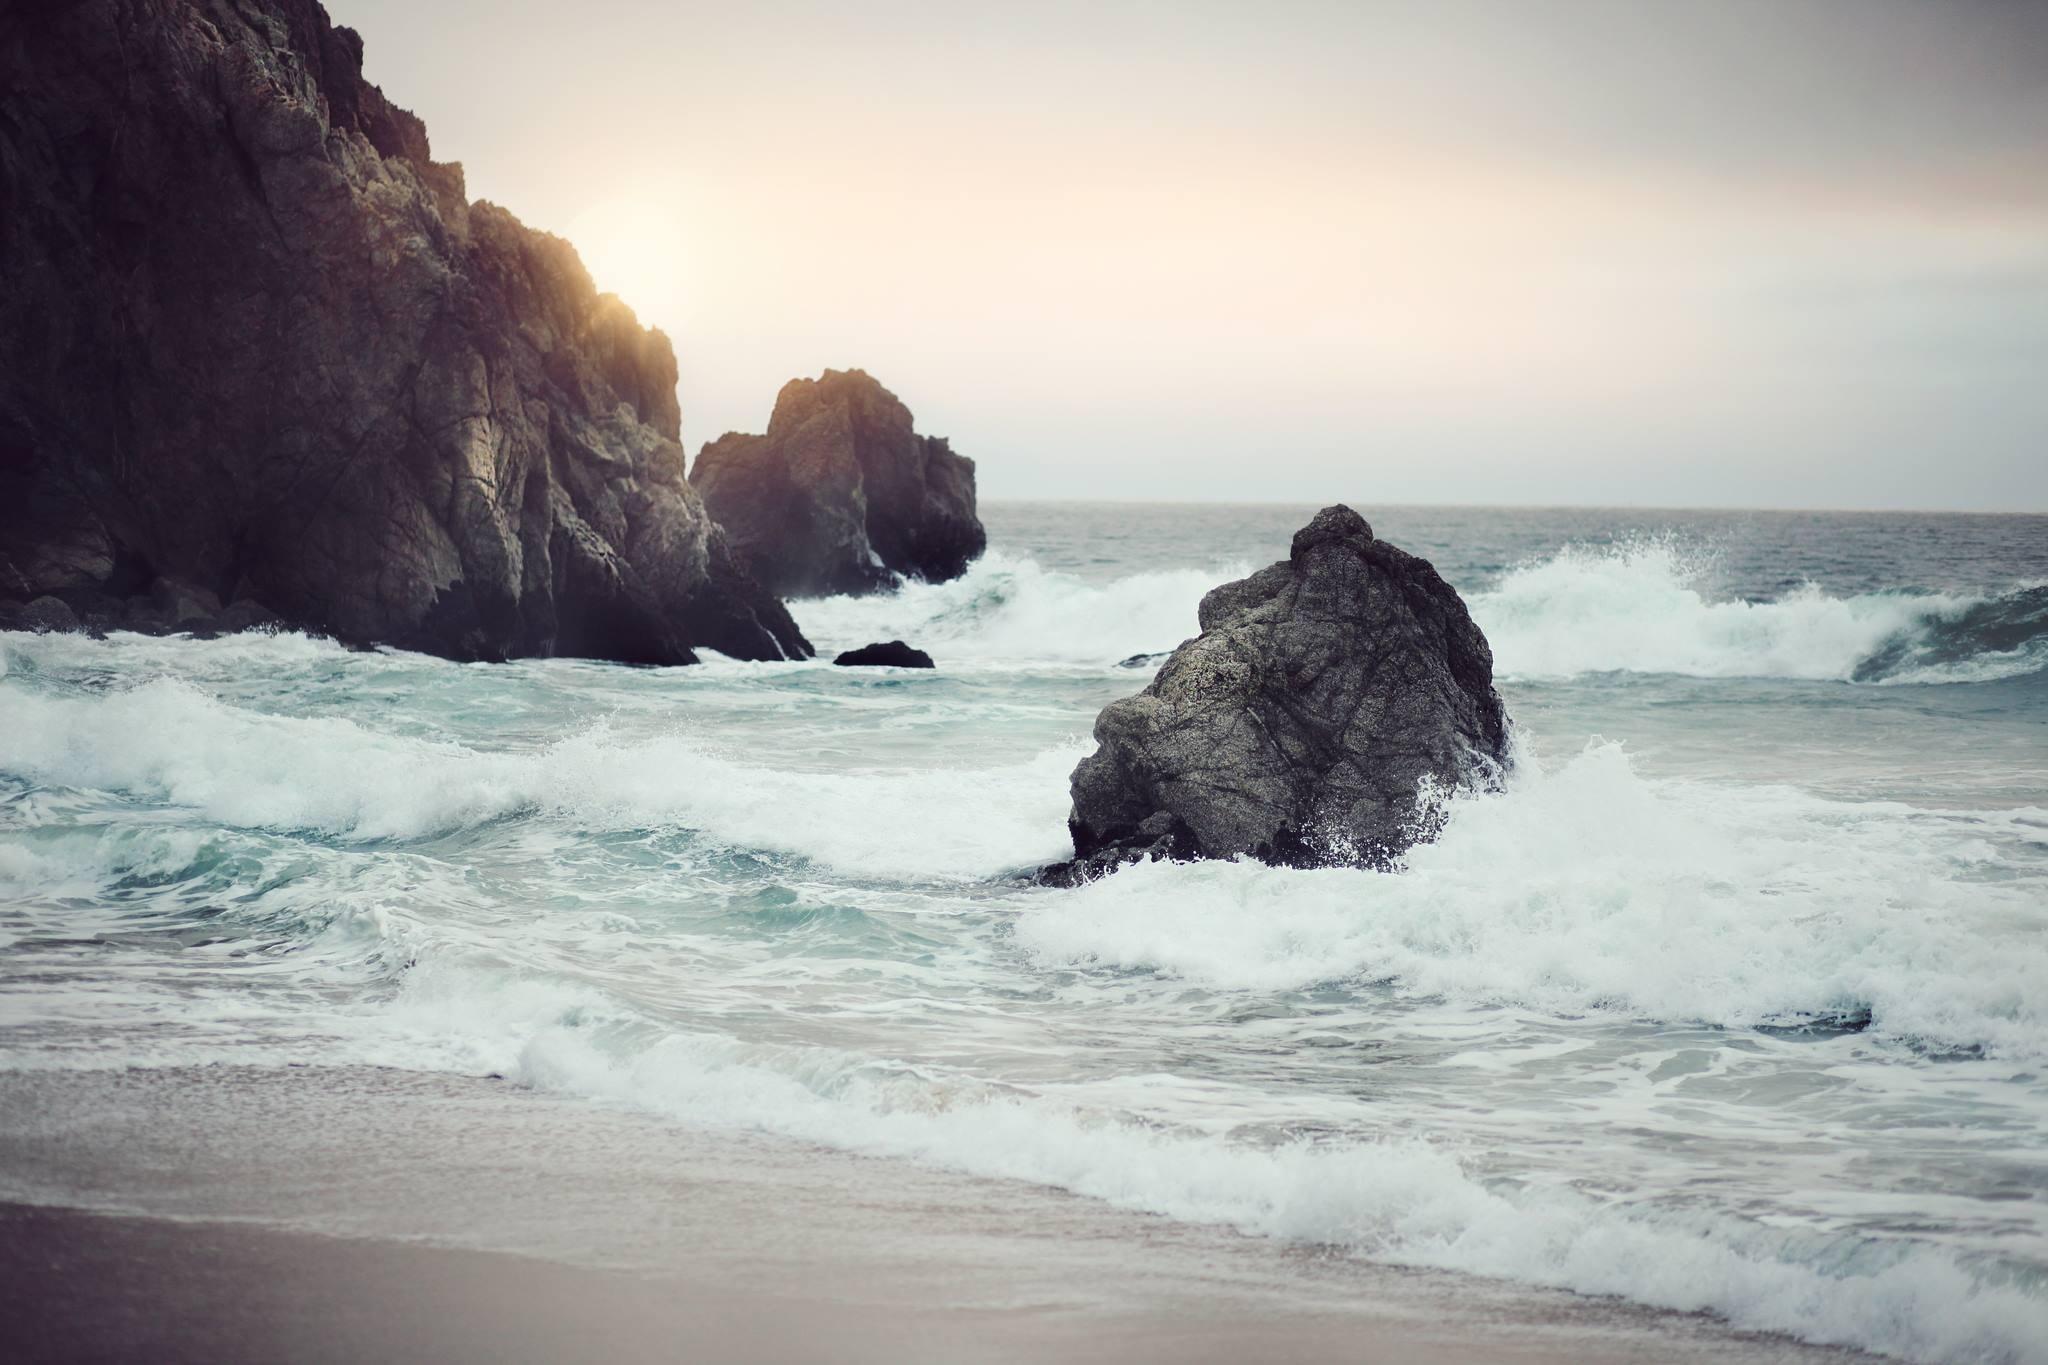 Ocean waves splashing coastal rocks near the sandy beach shoreline